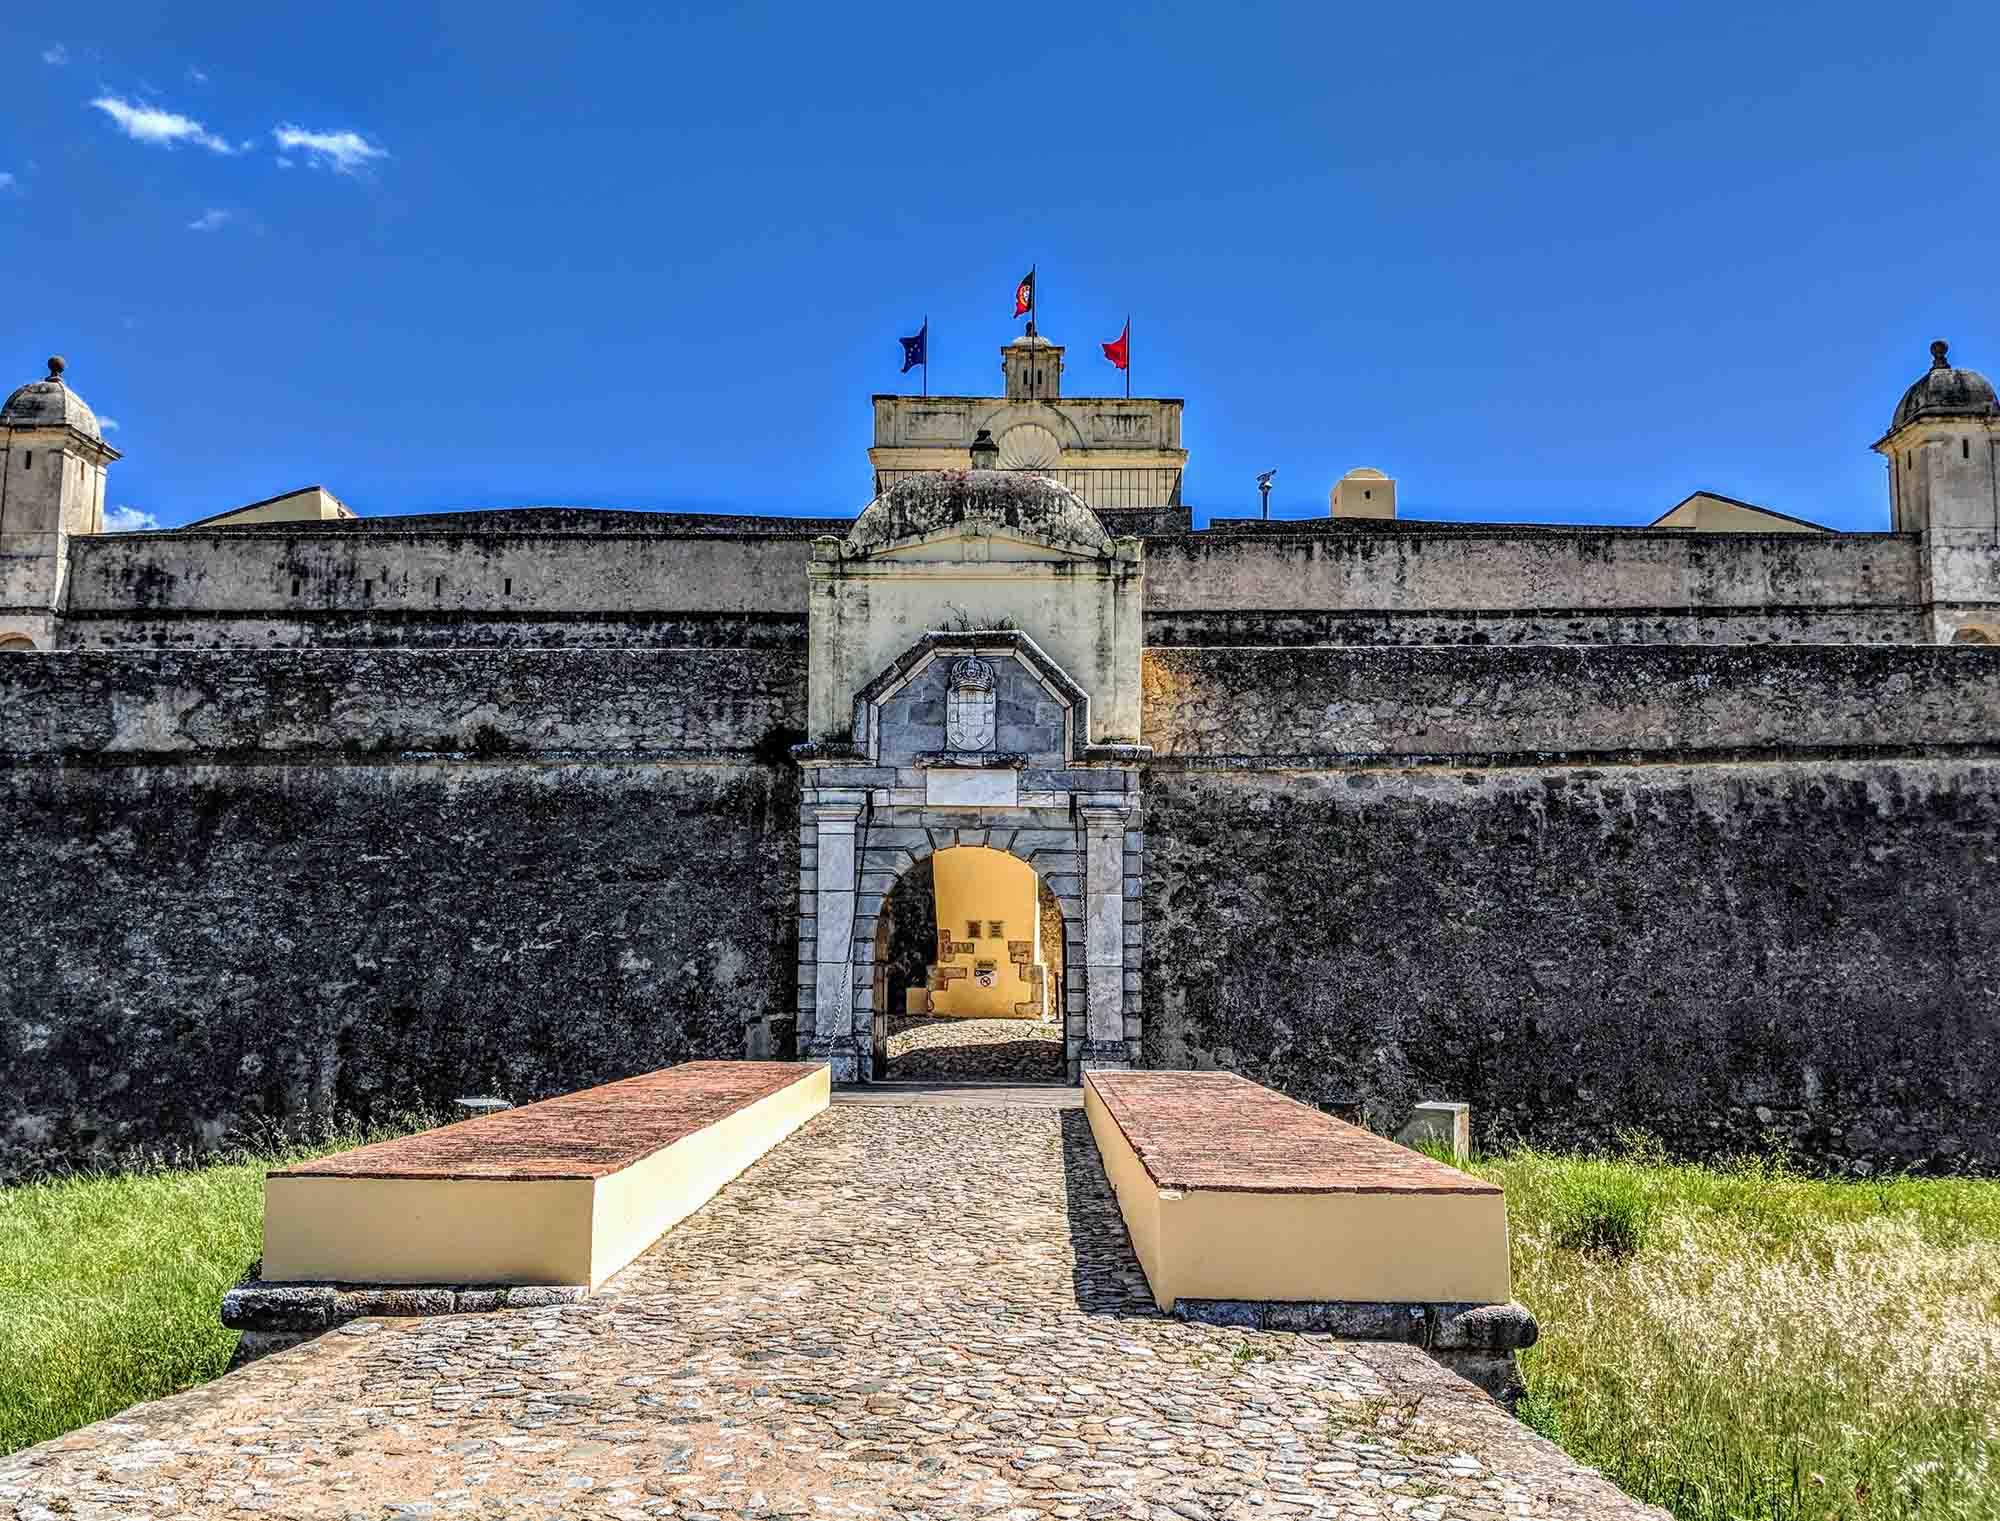 Forte de Santa Luzia entrance